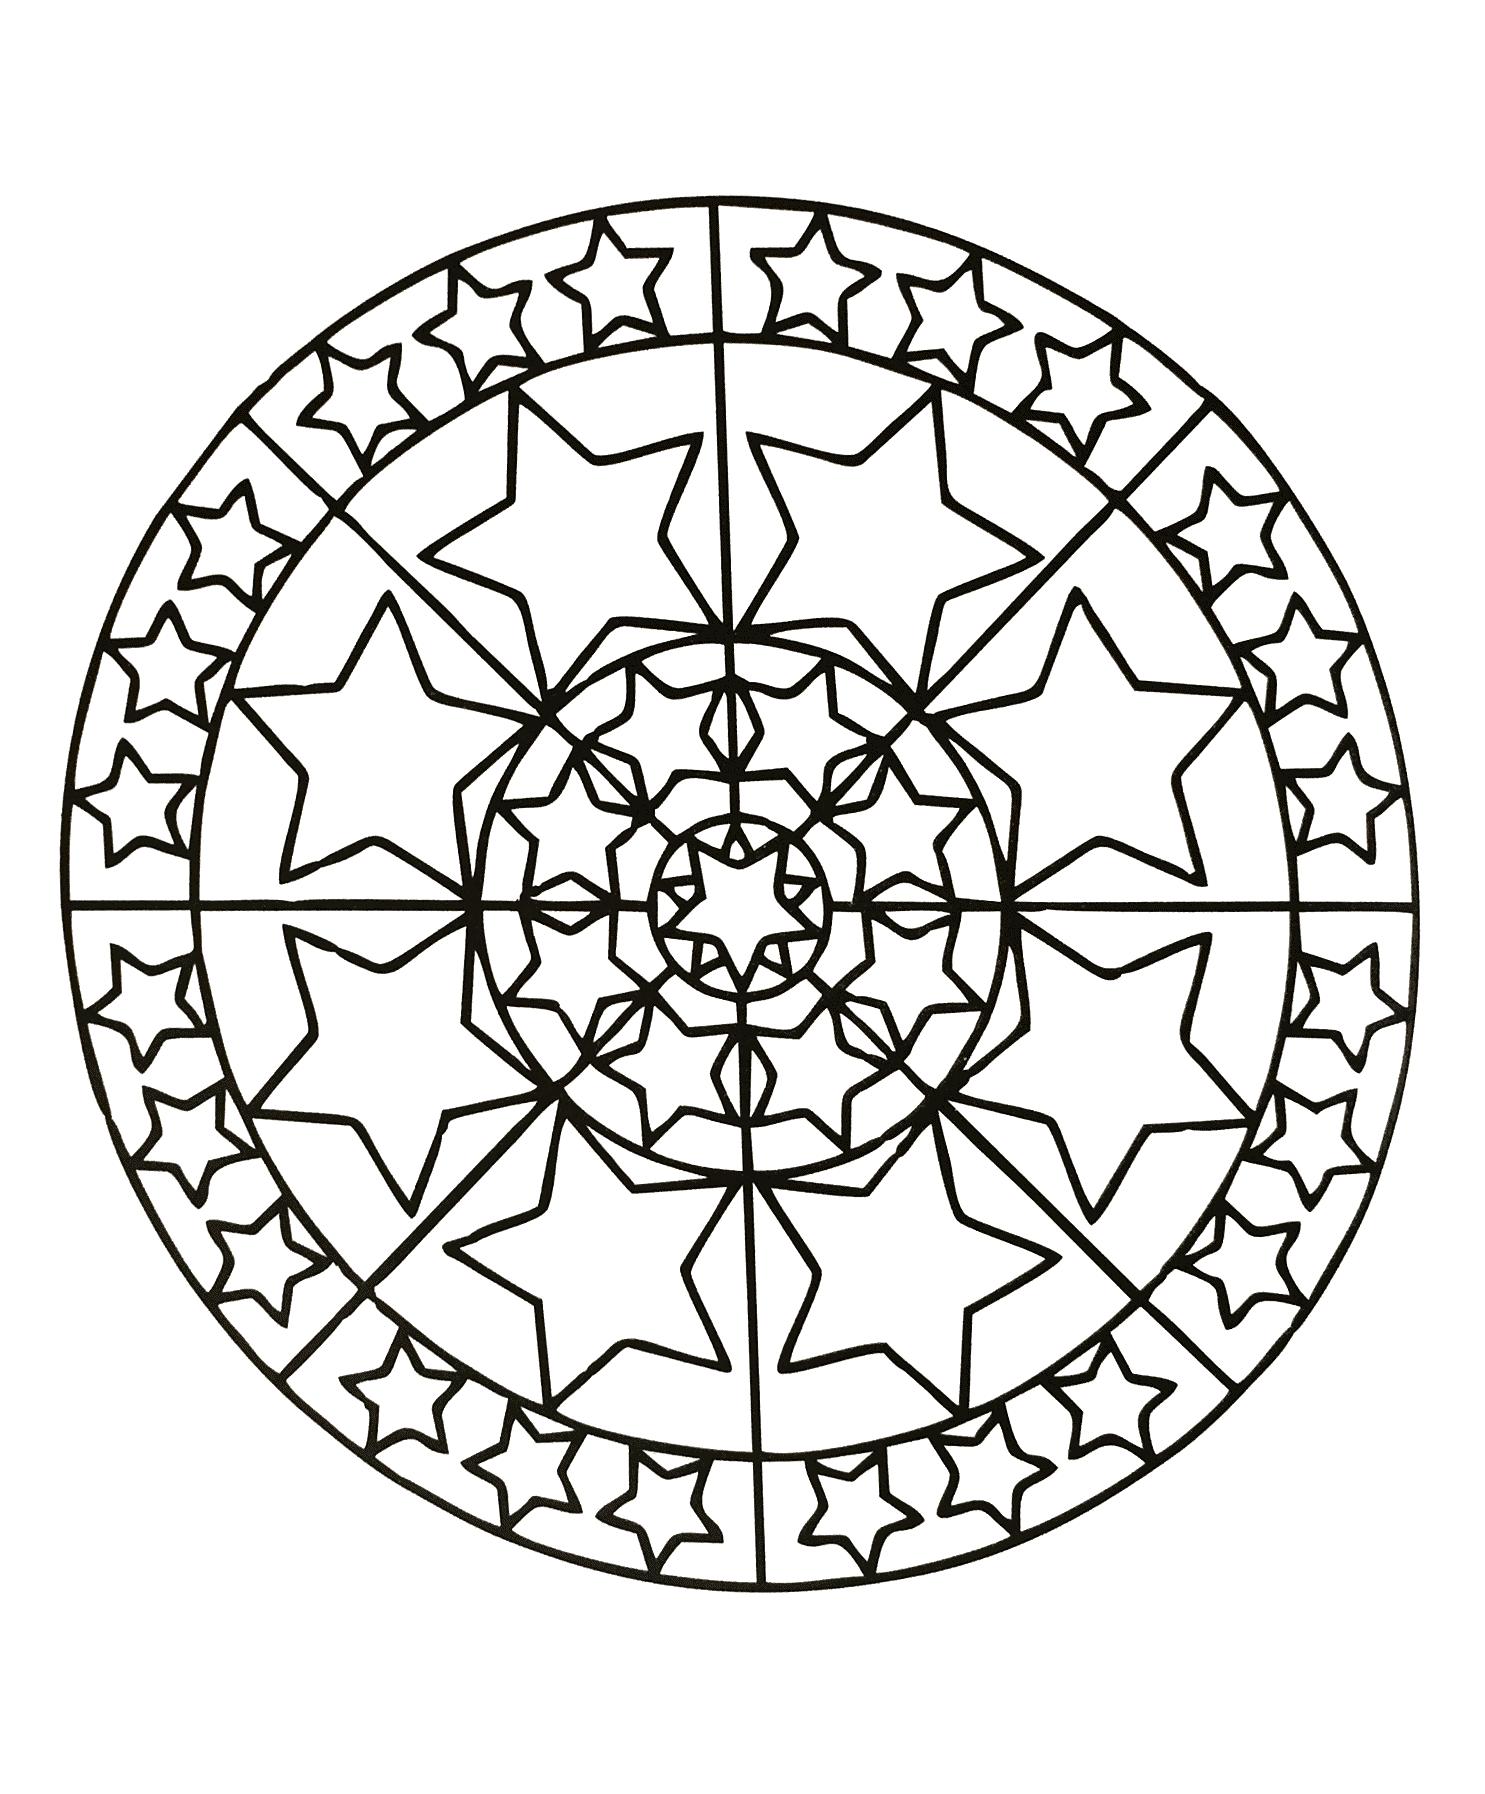 Coloriage De Mandala Etoile.Mandala Avec De Belles Etoiles Mandalas Zen Anti Stress 100